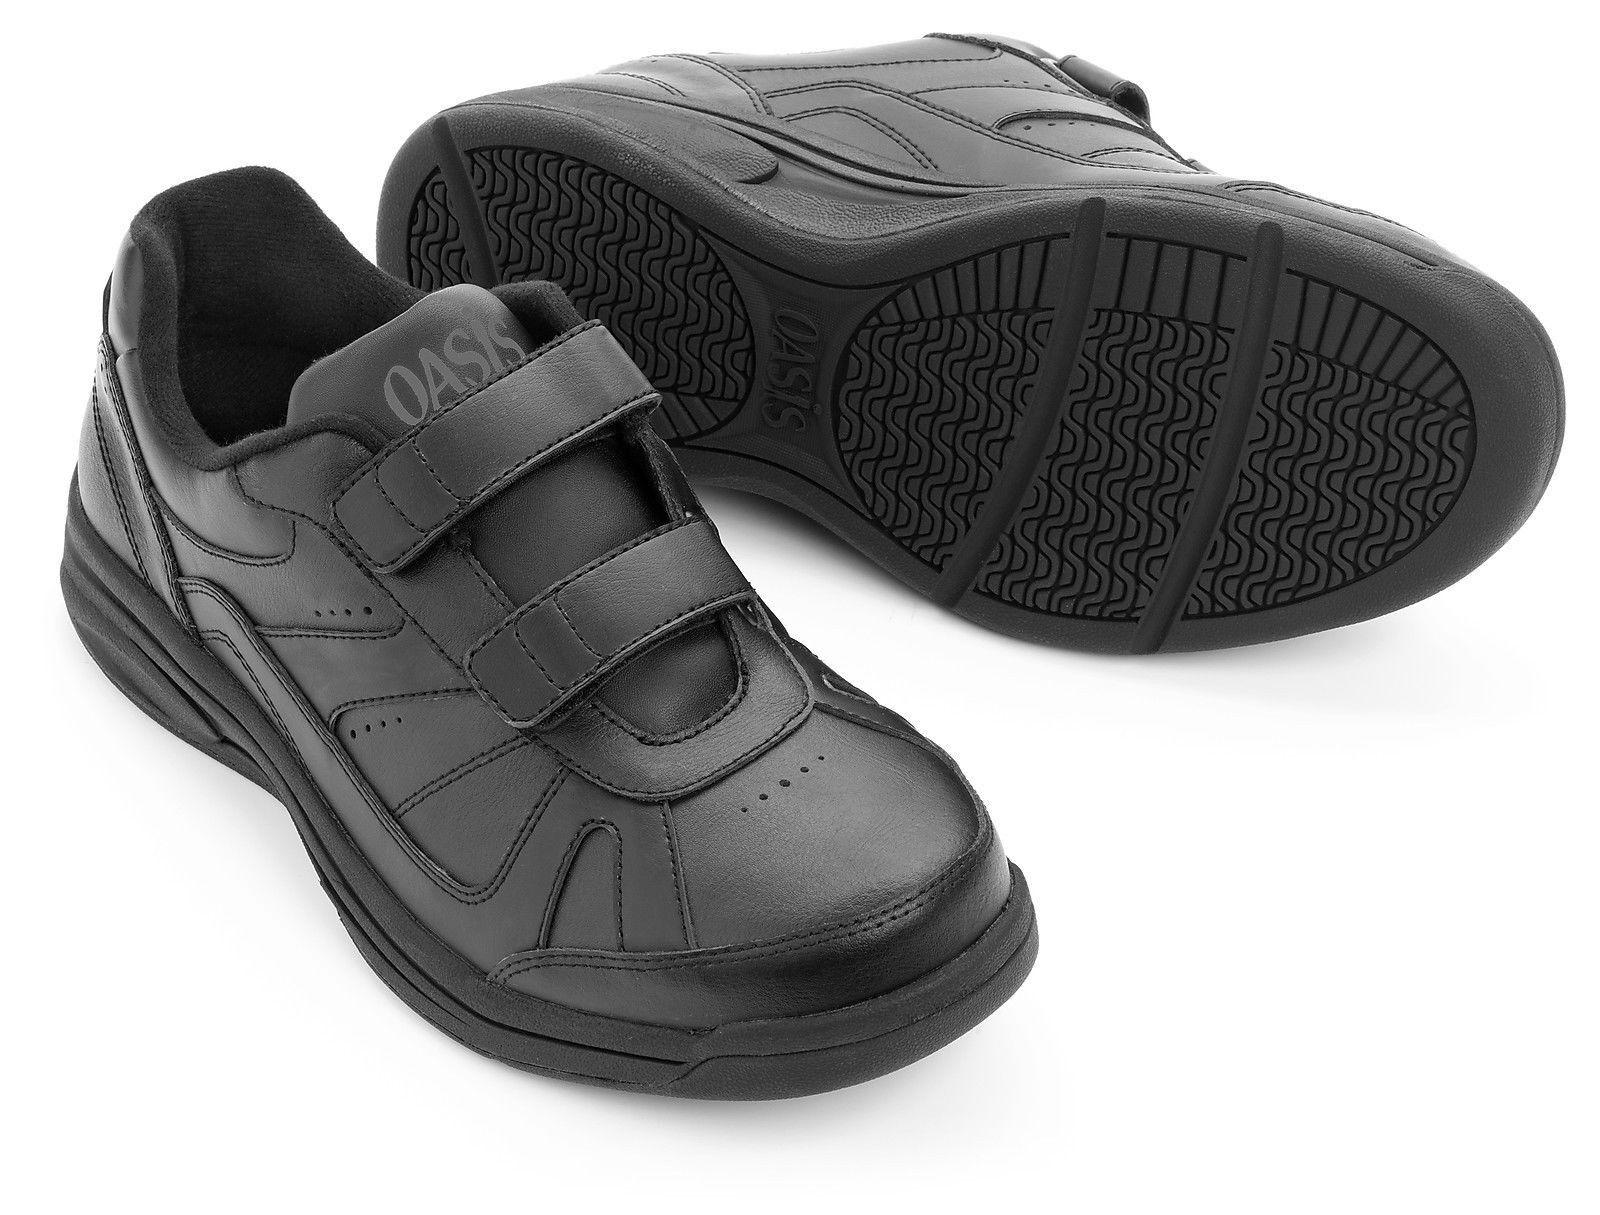 Oasis Tyler Hook - Loop - Extra  -Depth Hook  Loop scarpe da ginnastica - New in Box  vieni a scegliere il tuo stile sportivo